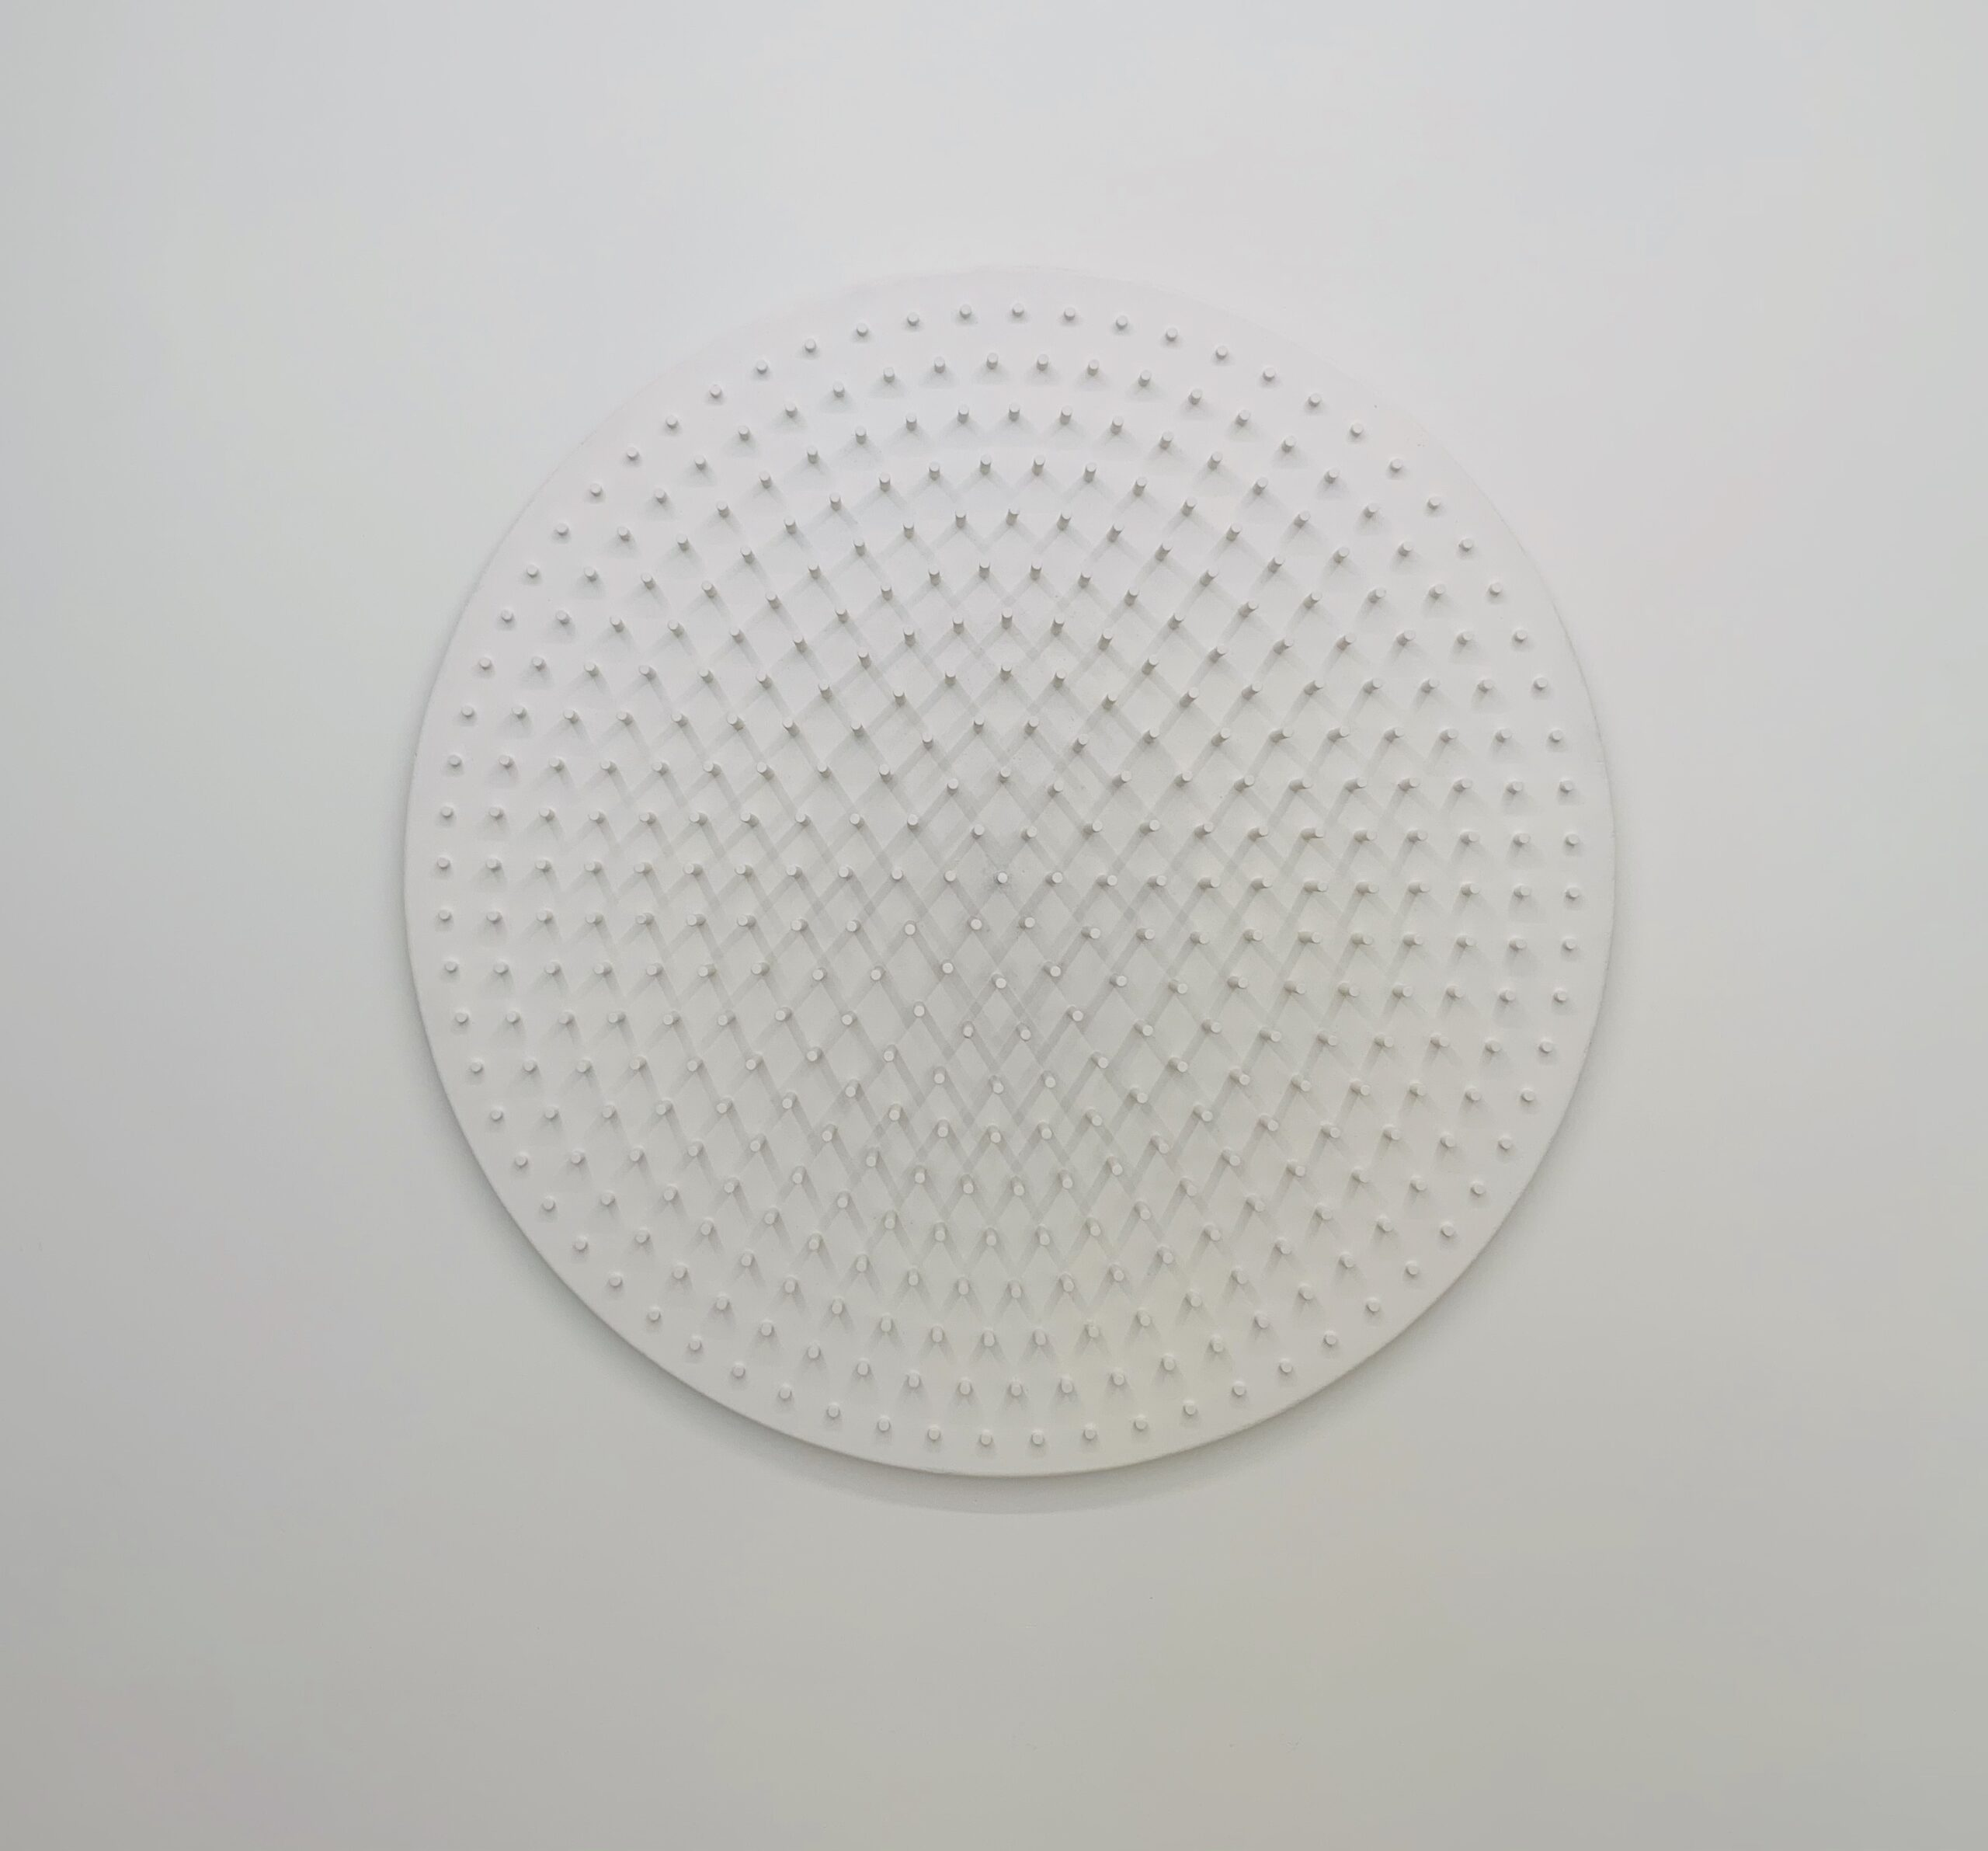 Ewerdt Hilgemann, Object Nr.89, 1970